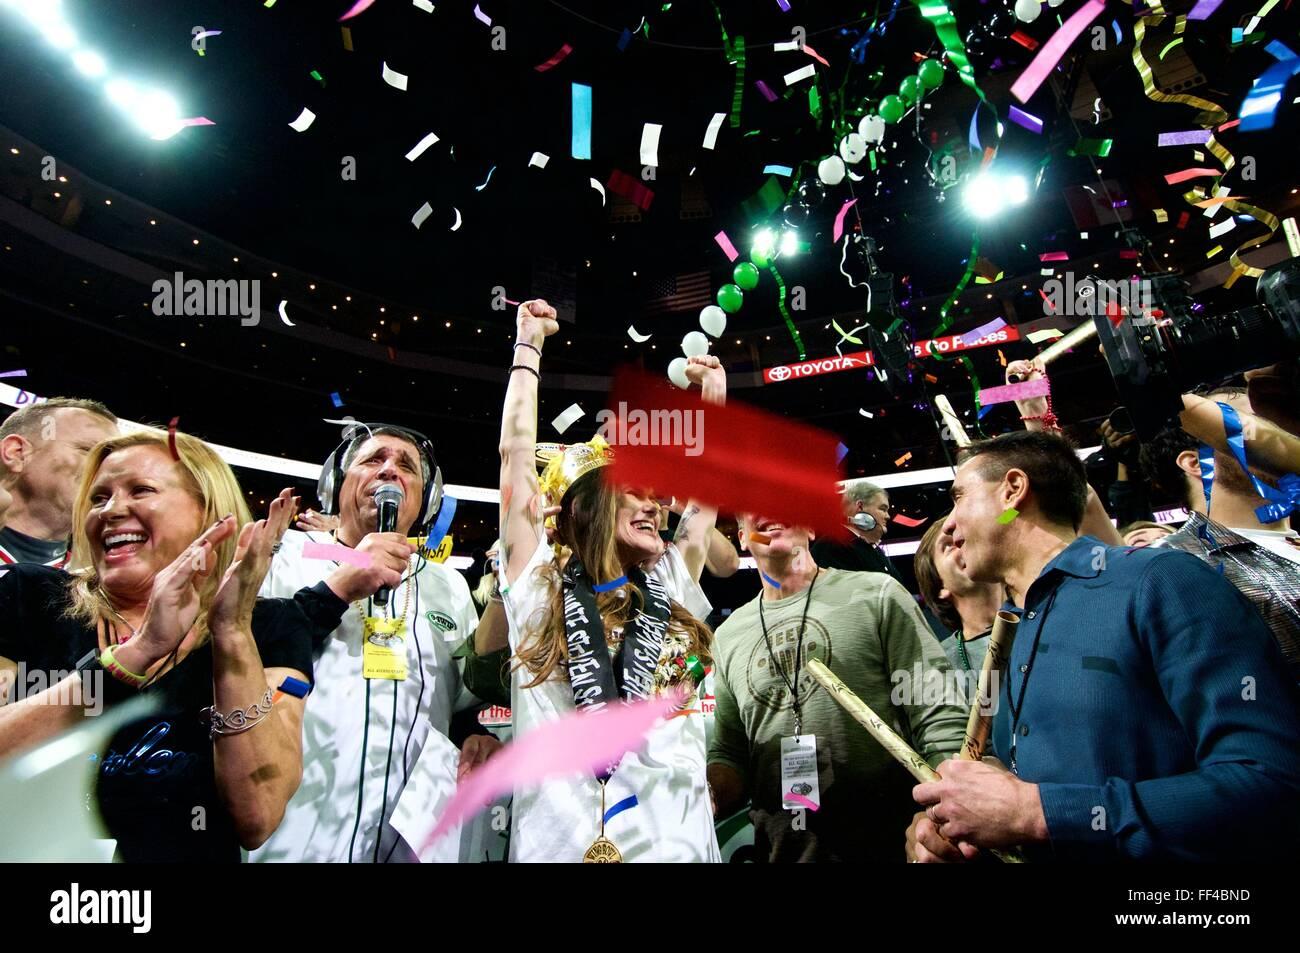 Wettbewerbsfähige Esser Molly Schuyler feiert nach dem Sieg Wing Bowl XXIV in Philadelphia, PA Stockbild